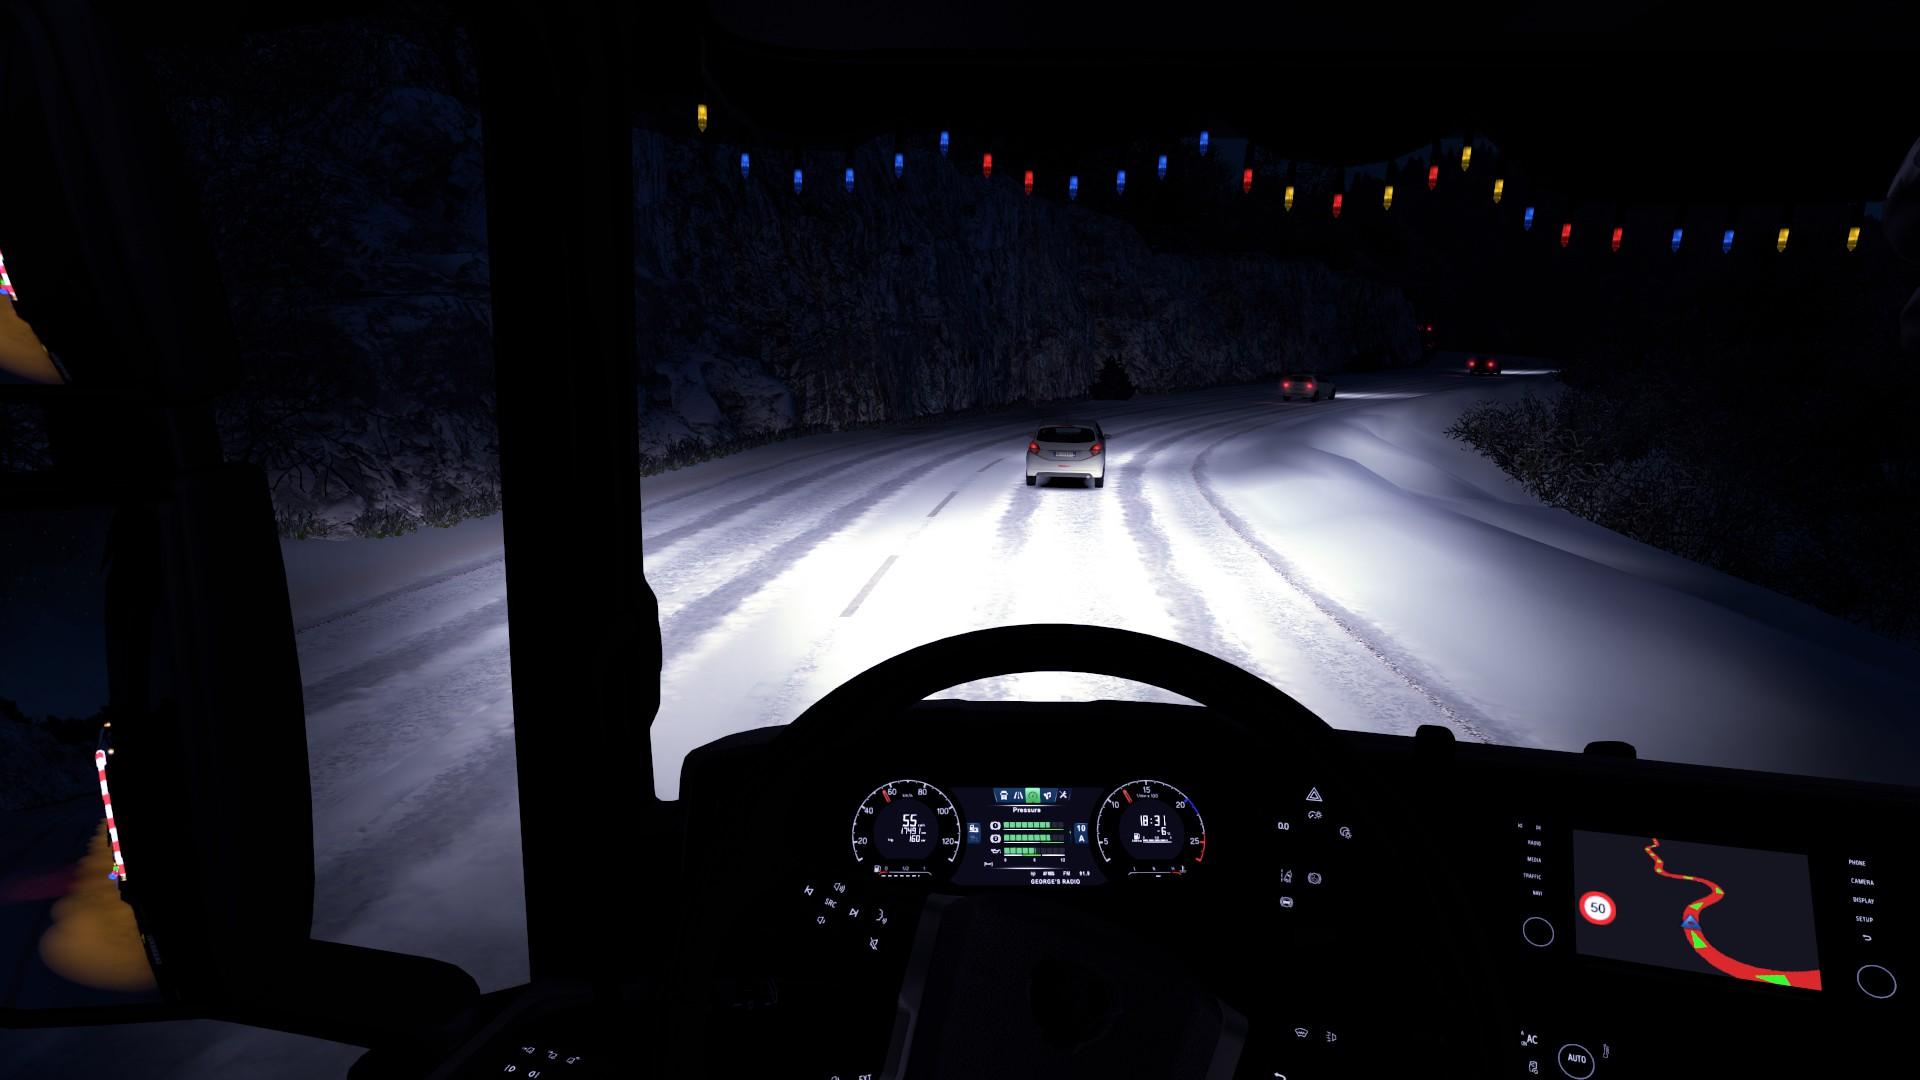 20191223200932_1.jpg - Euro Truck Simulator 2